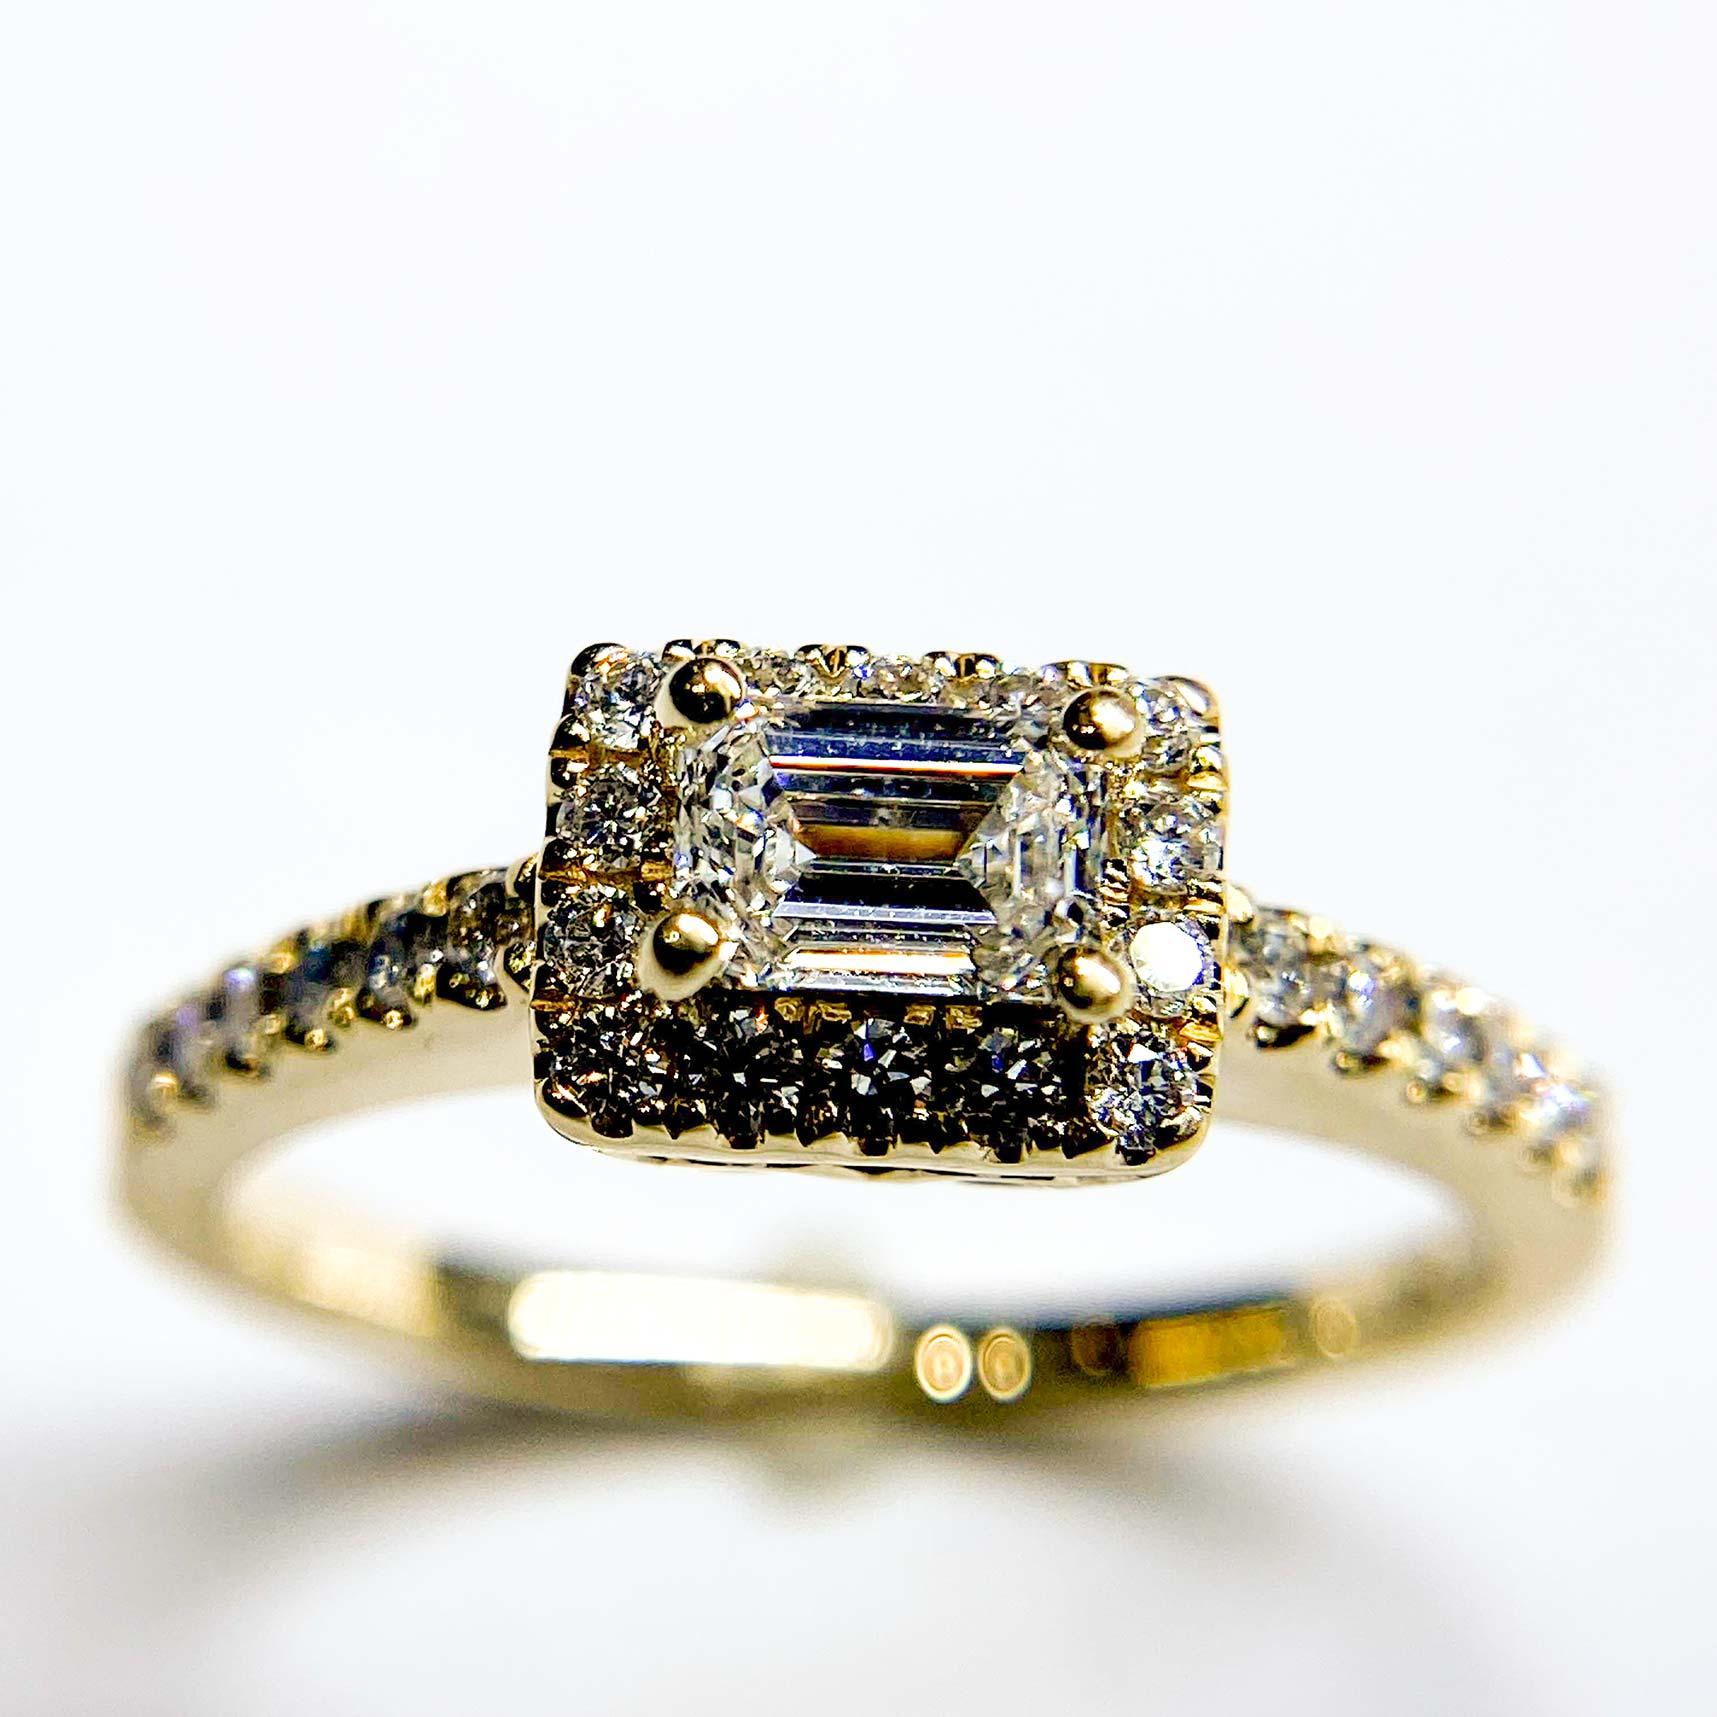 Emerald Cut Diamond Engagement Ring Robert And Gabriel Jewelers